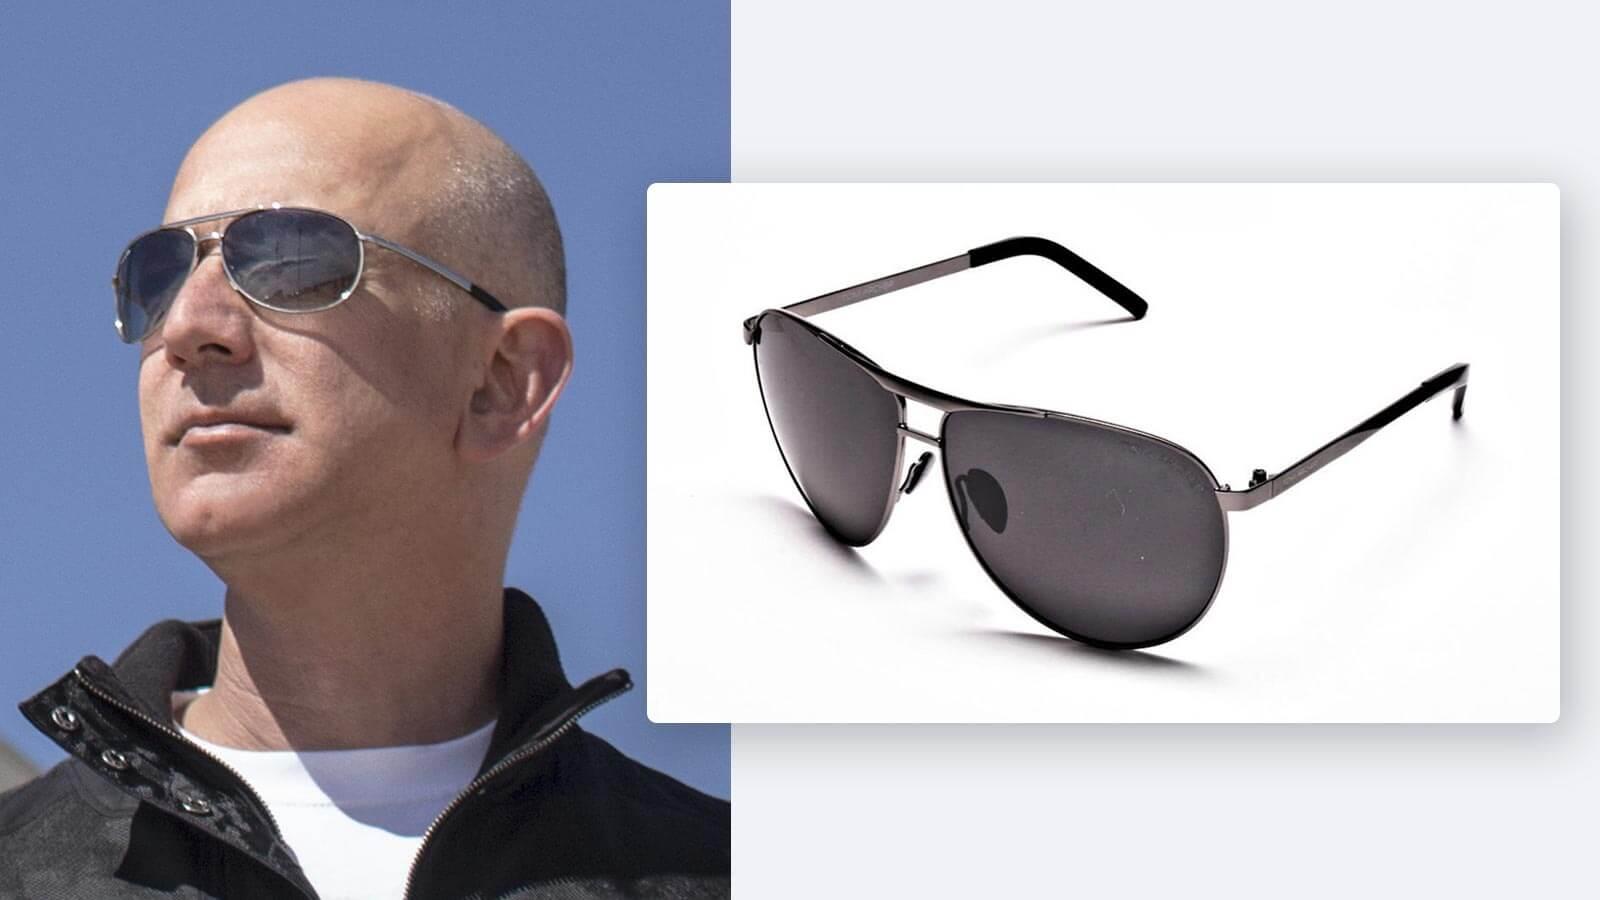 Jeff Bezos Sunglasses